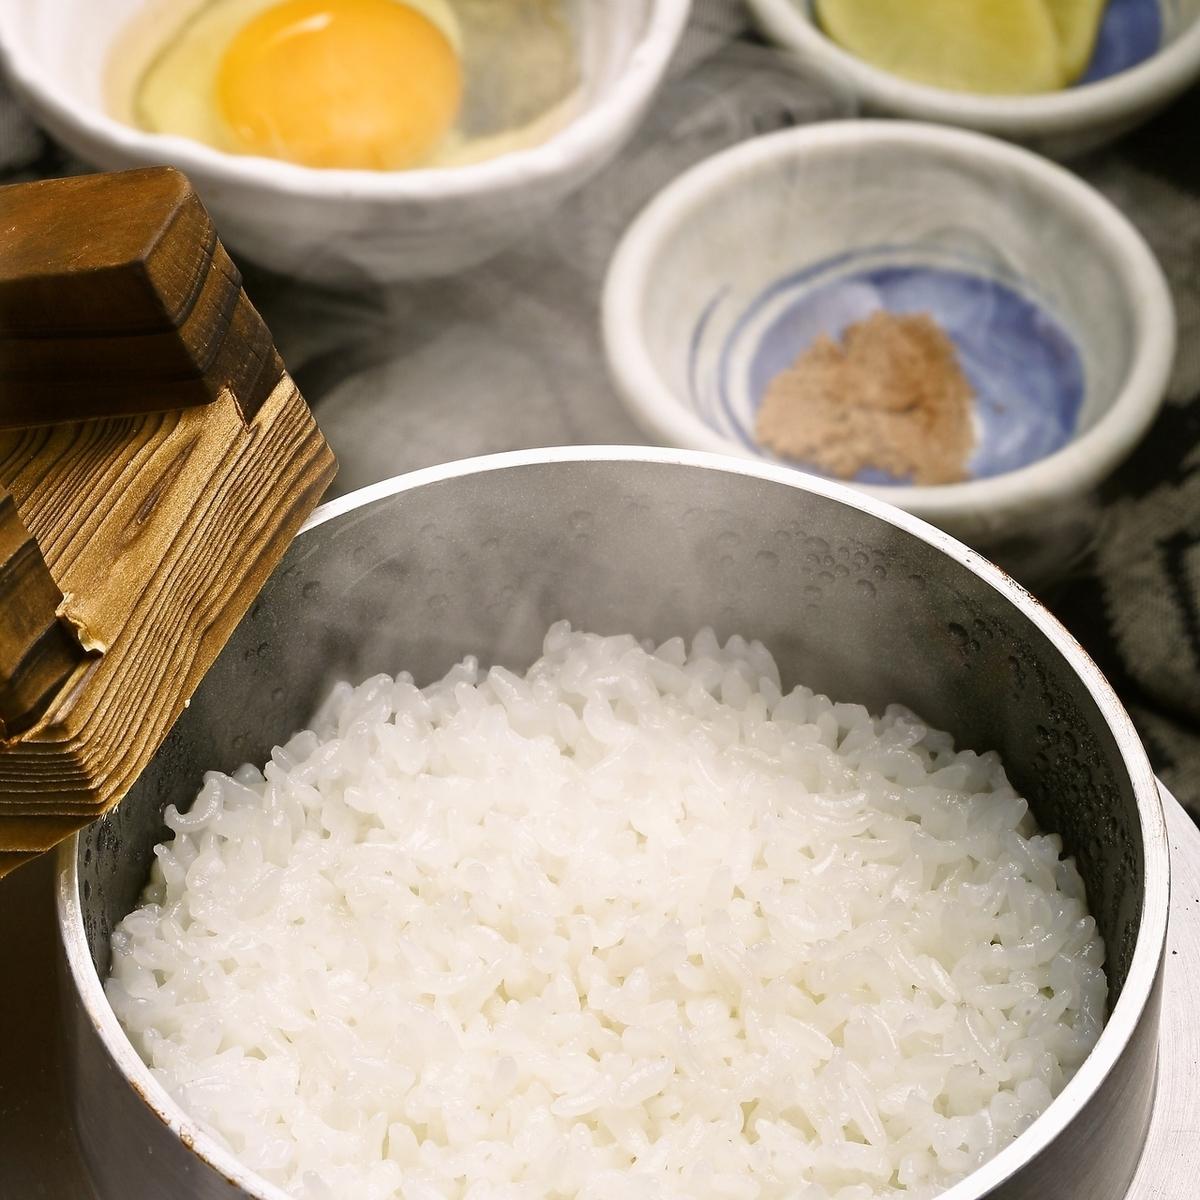 Tosa Jiro用土佐希拉的雞蛋煮熟的米飯